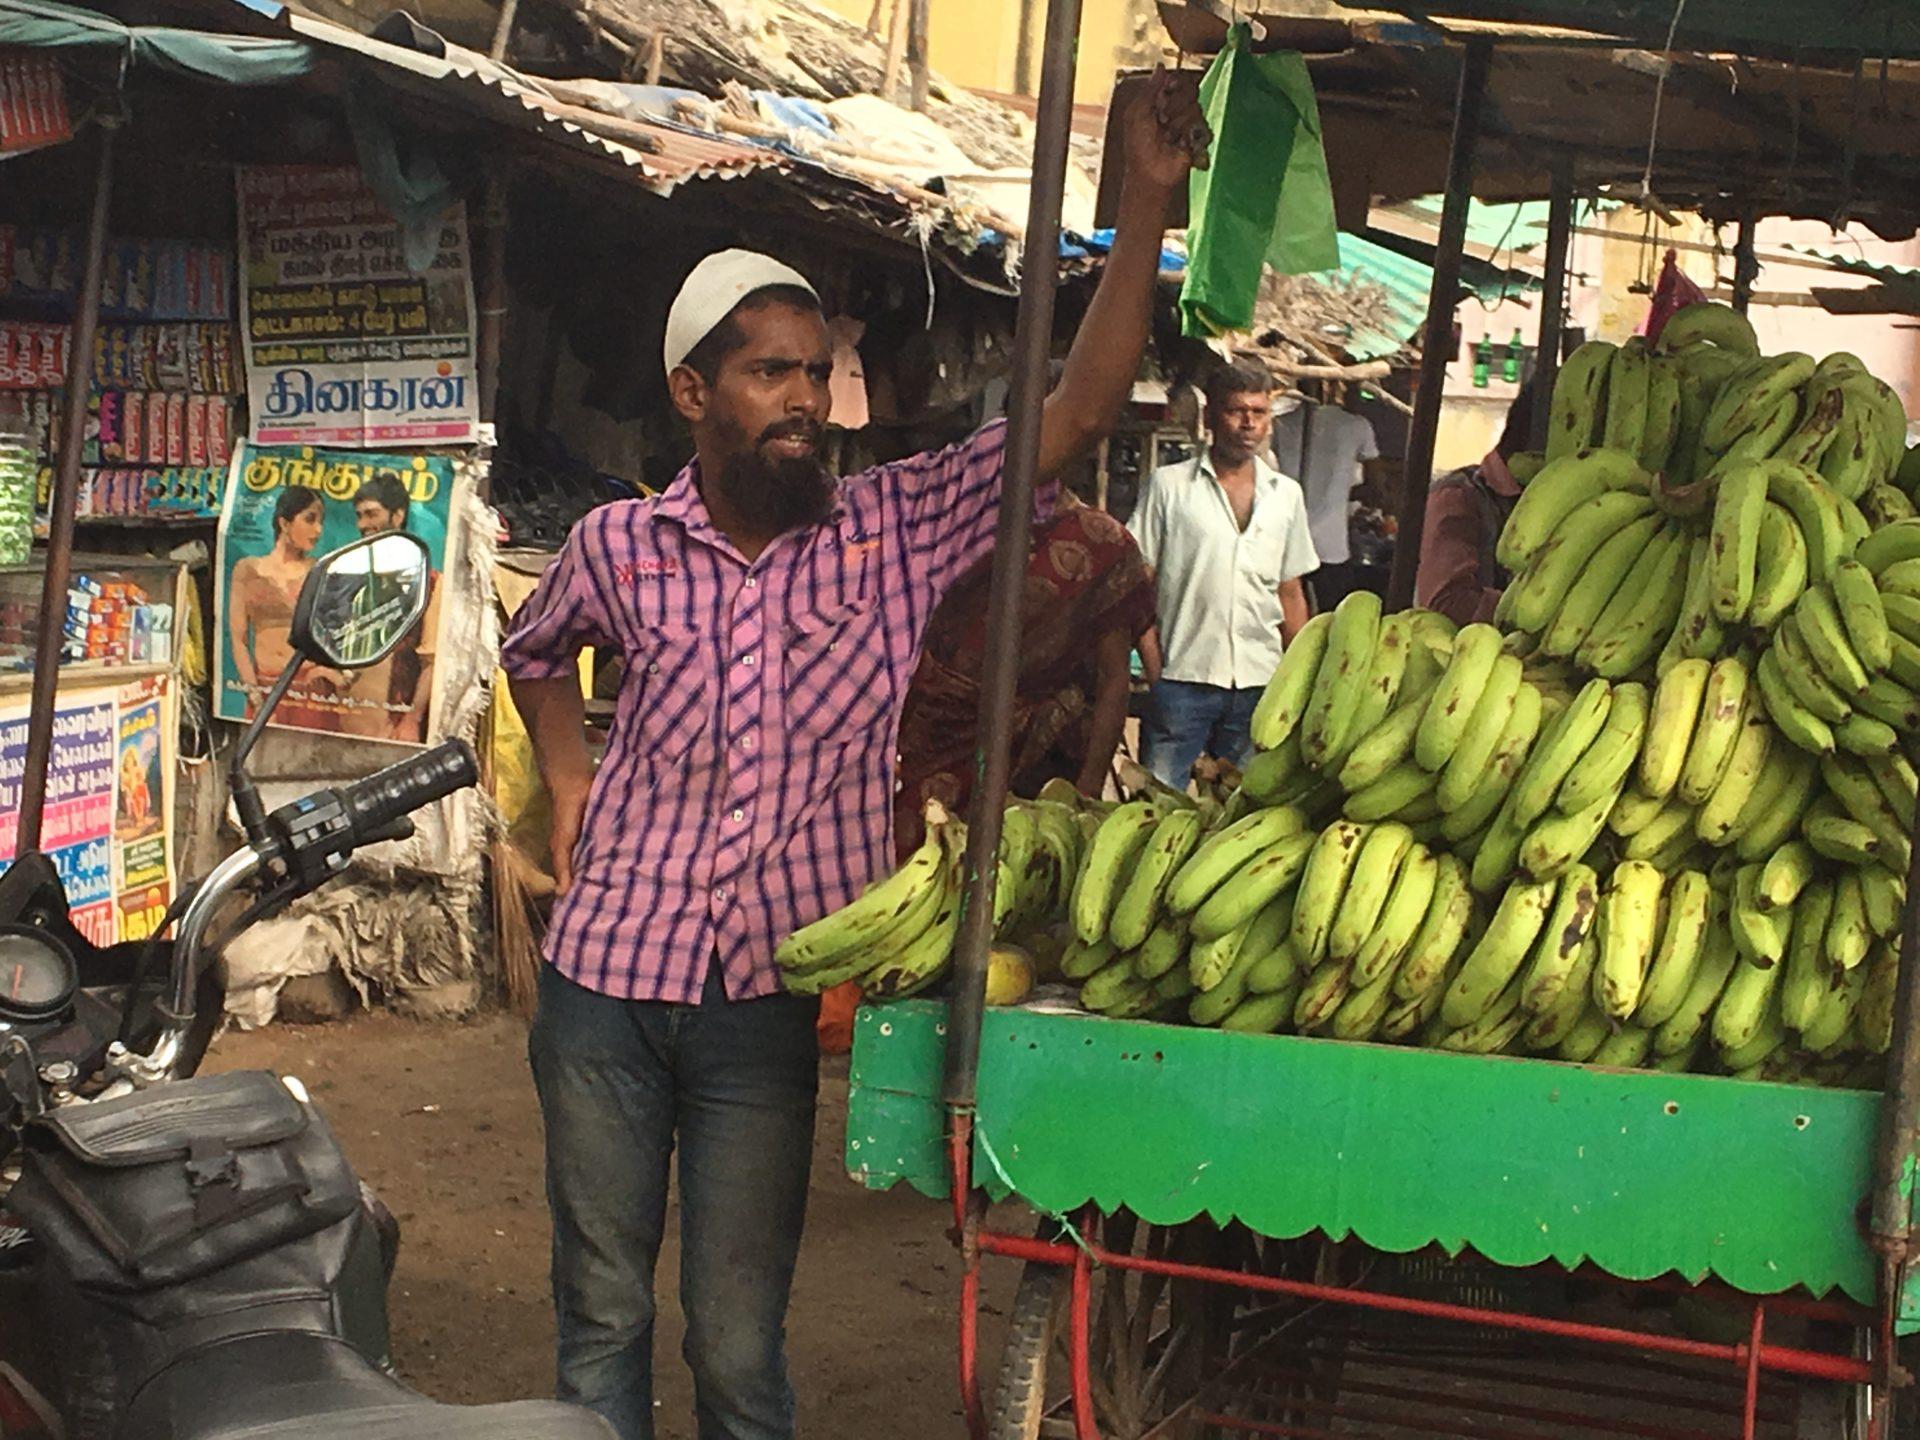 Banana salesman, India